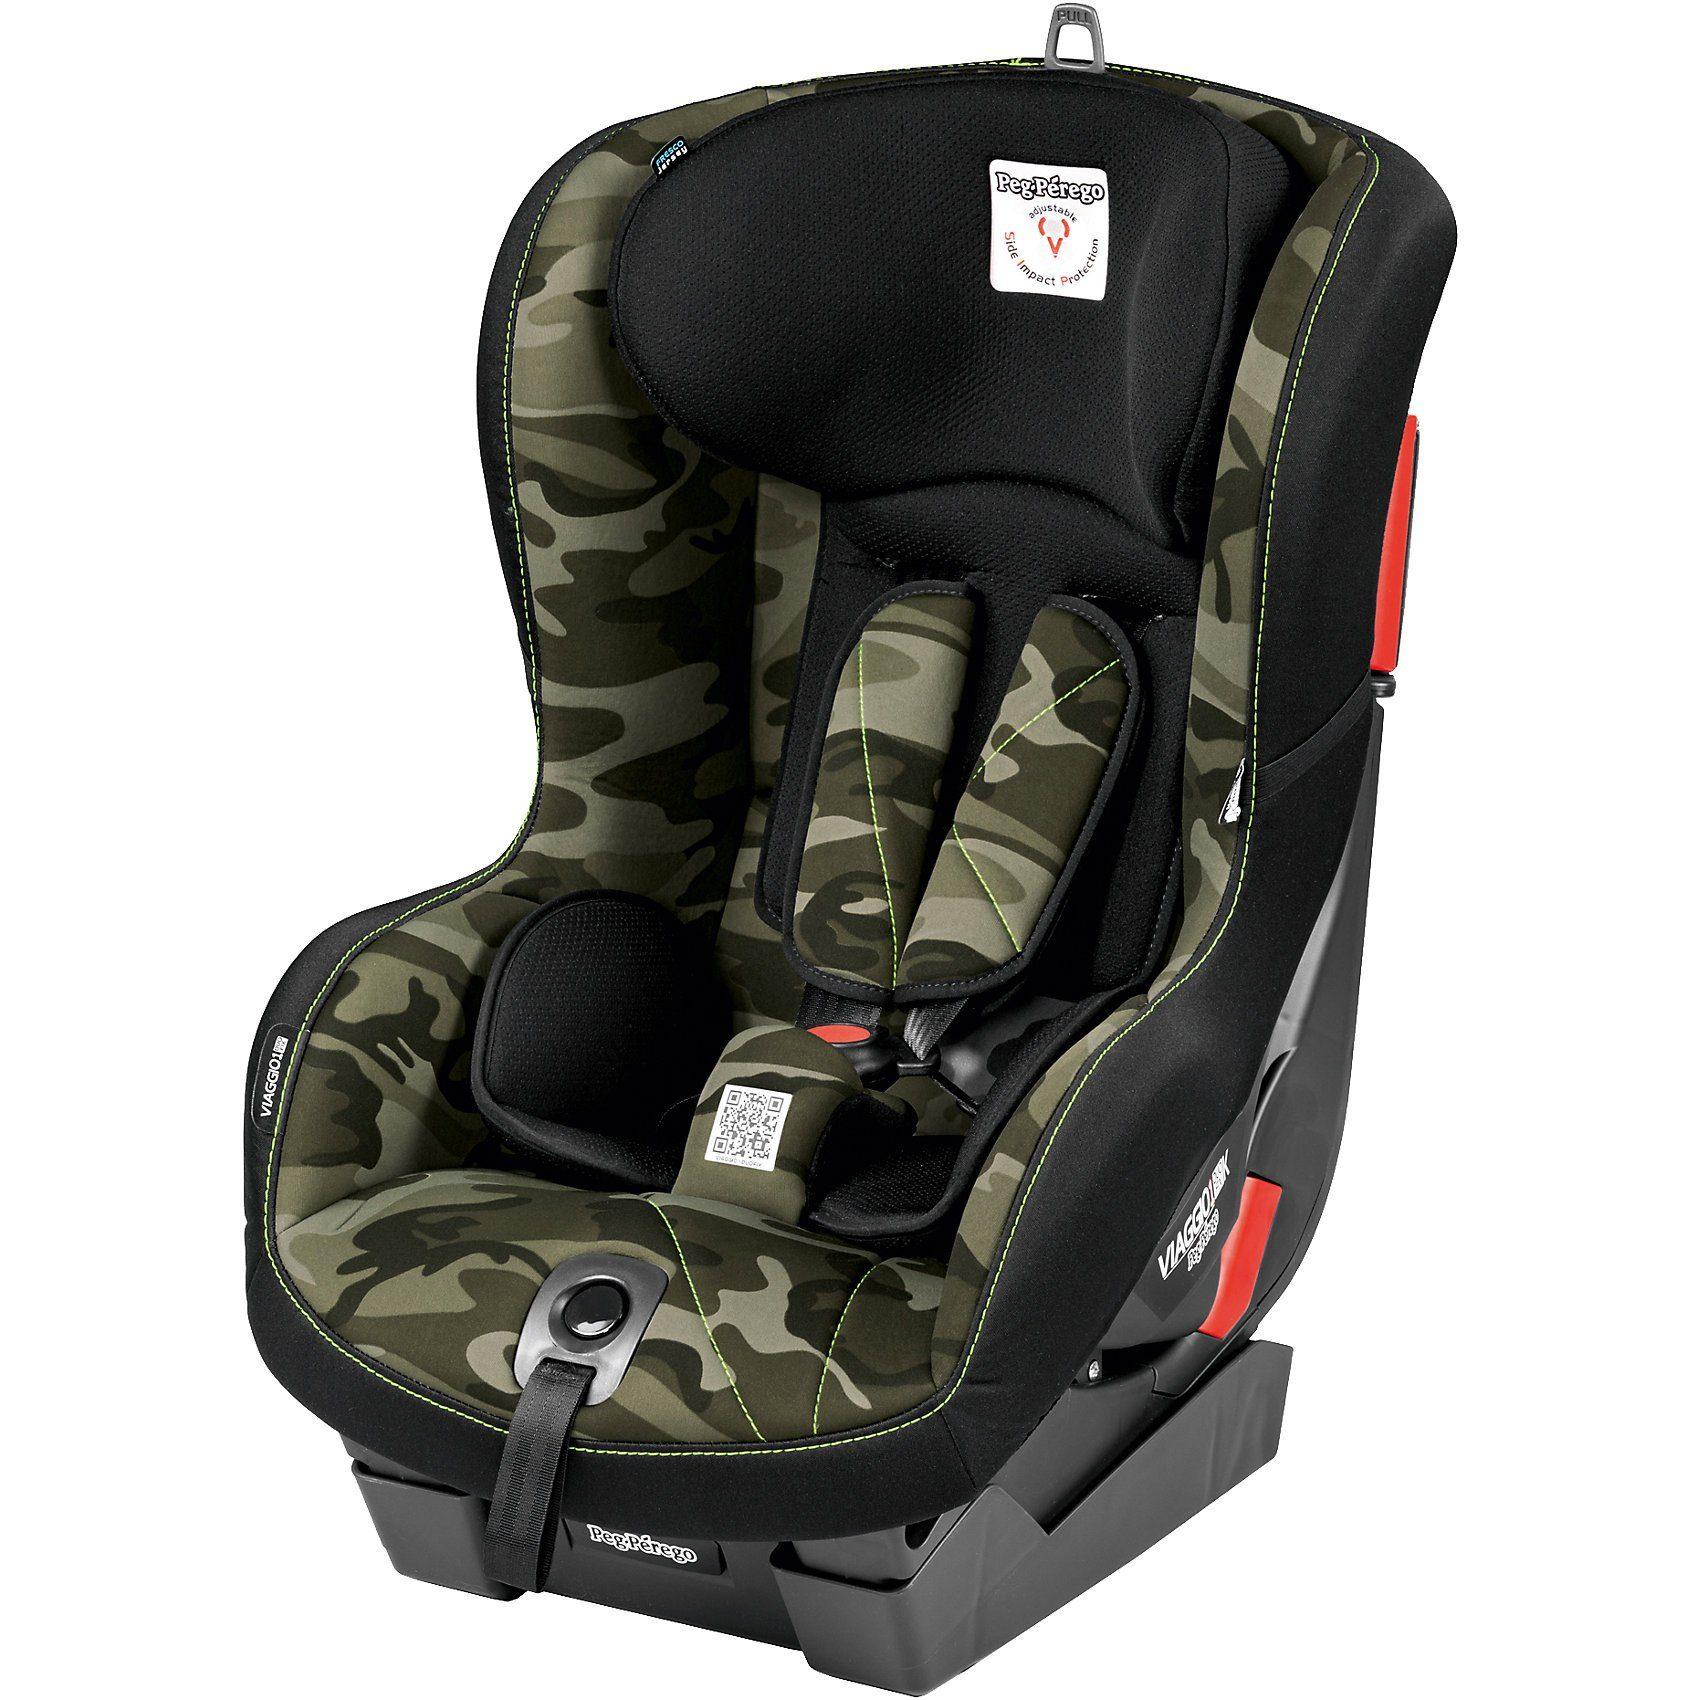 Peg Perego Auto-Kindersitz Viaggio1 Duo-Fix K, Camo Green, 2018